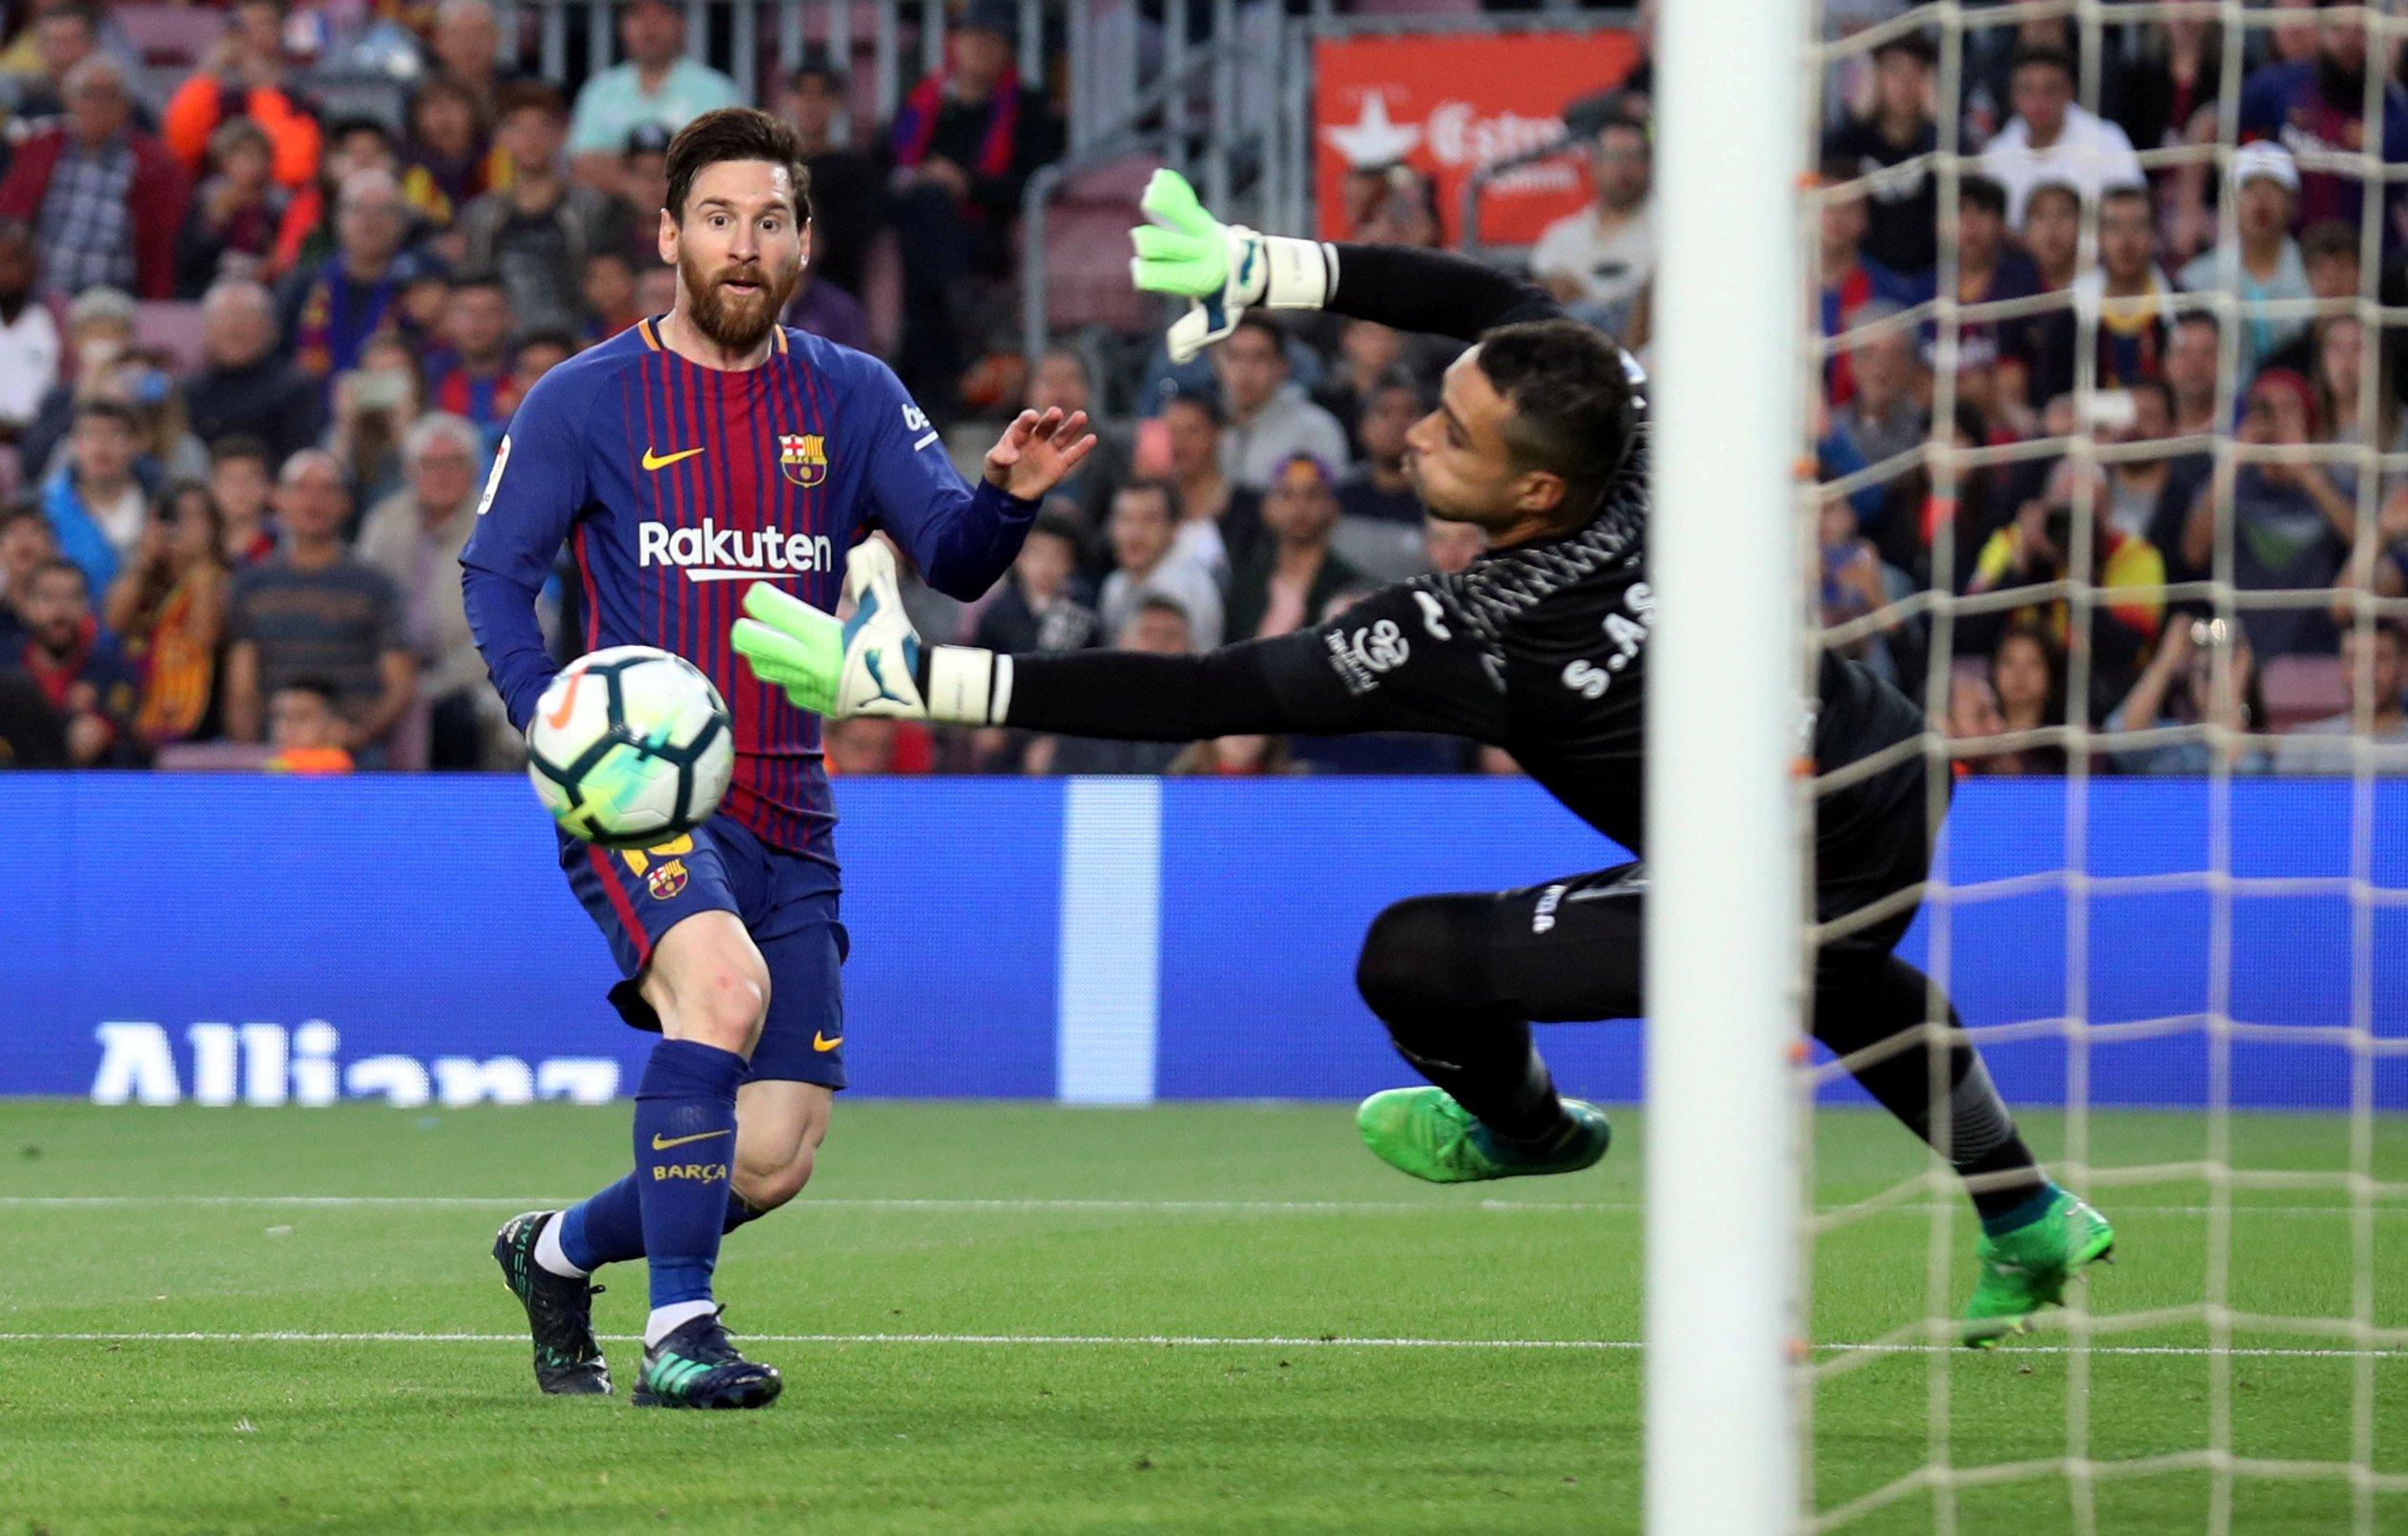 Soccer Football - La Liga Santander - FC Barcelona v Villarreal - Camp Nou, Barcelona, Spain - May 9, 2018   Barcelona